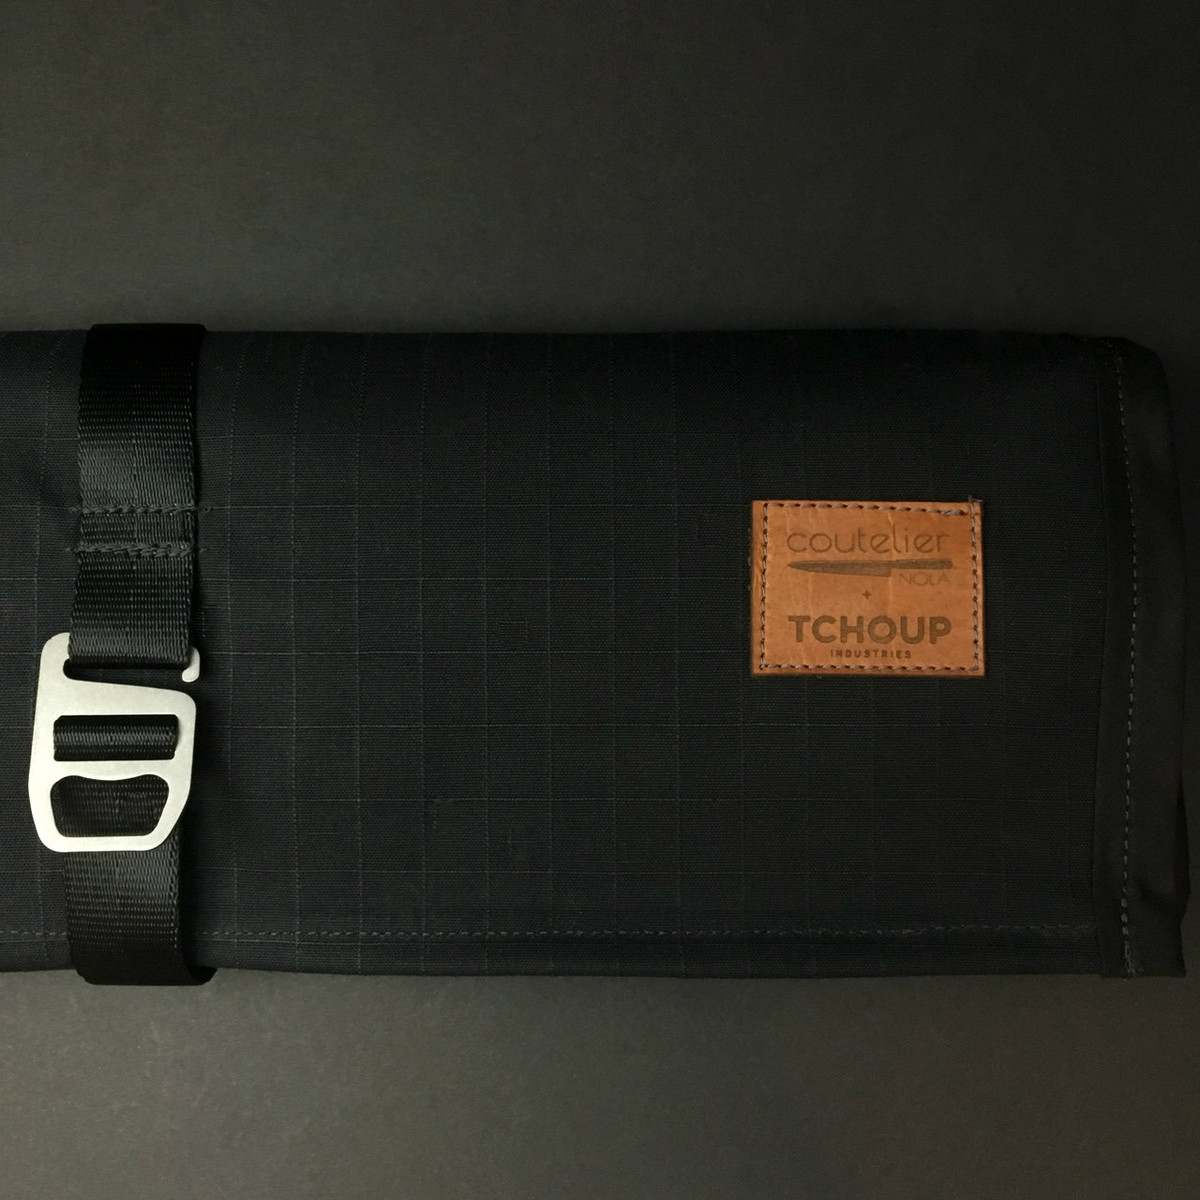 Tchoup Bags - Knife Roll - 9 Pocket - Black